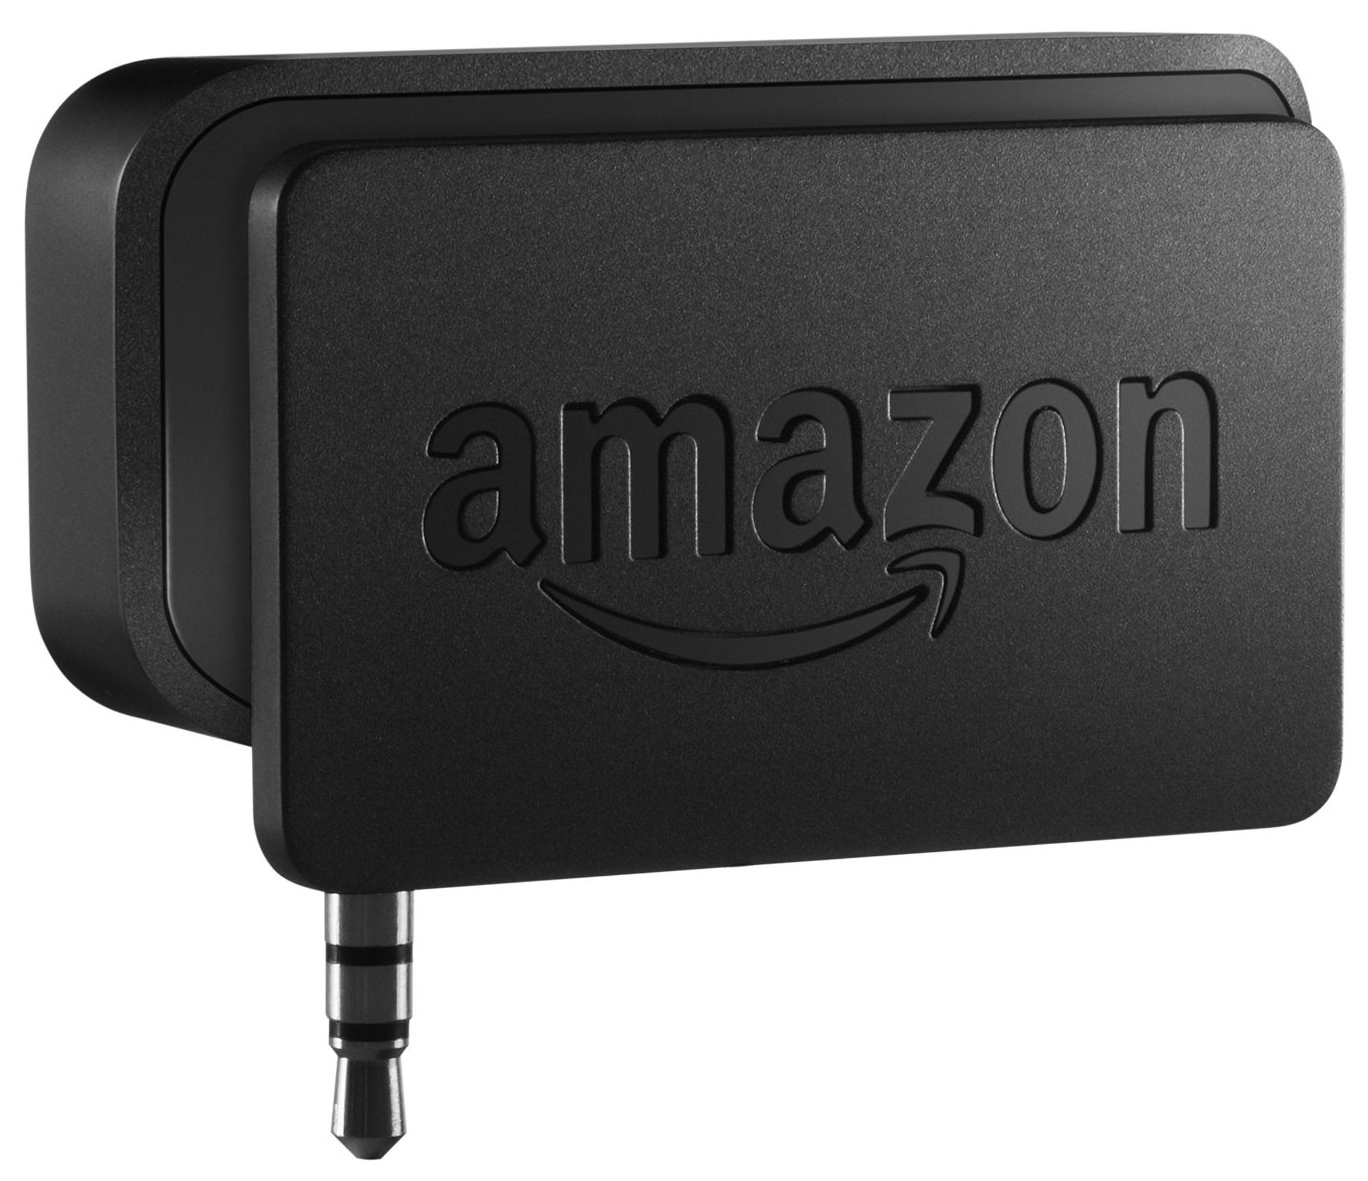 Amazon Local Register (image 001)